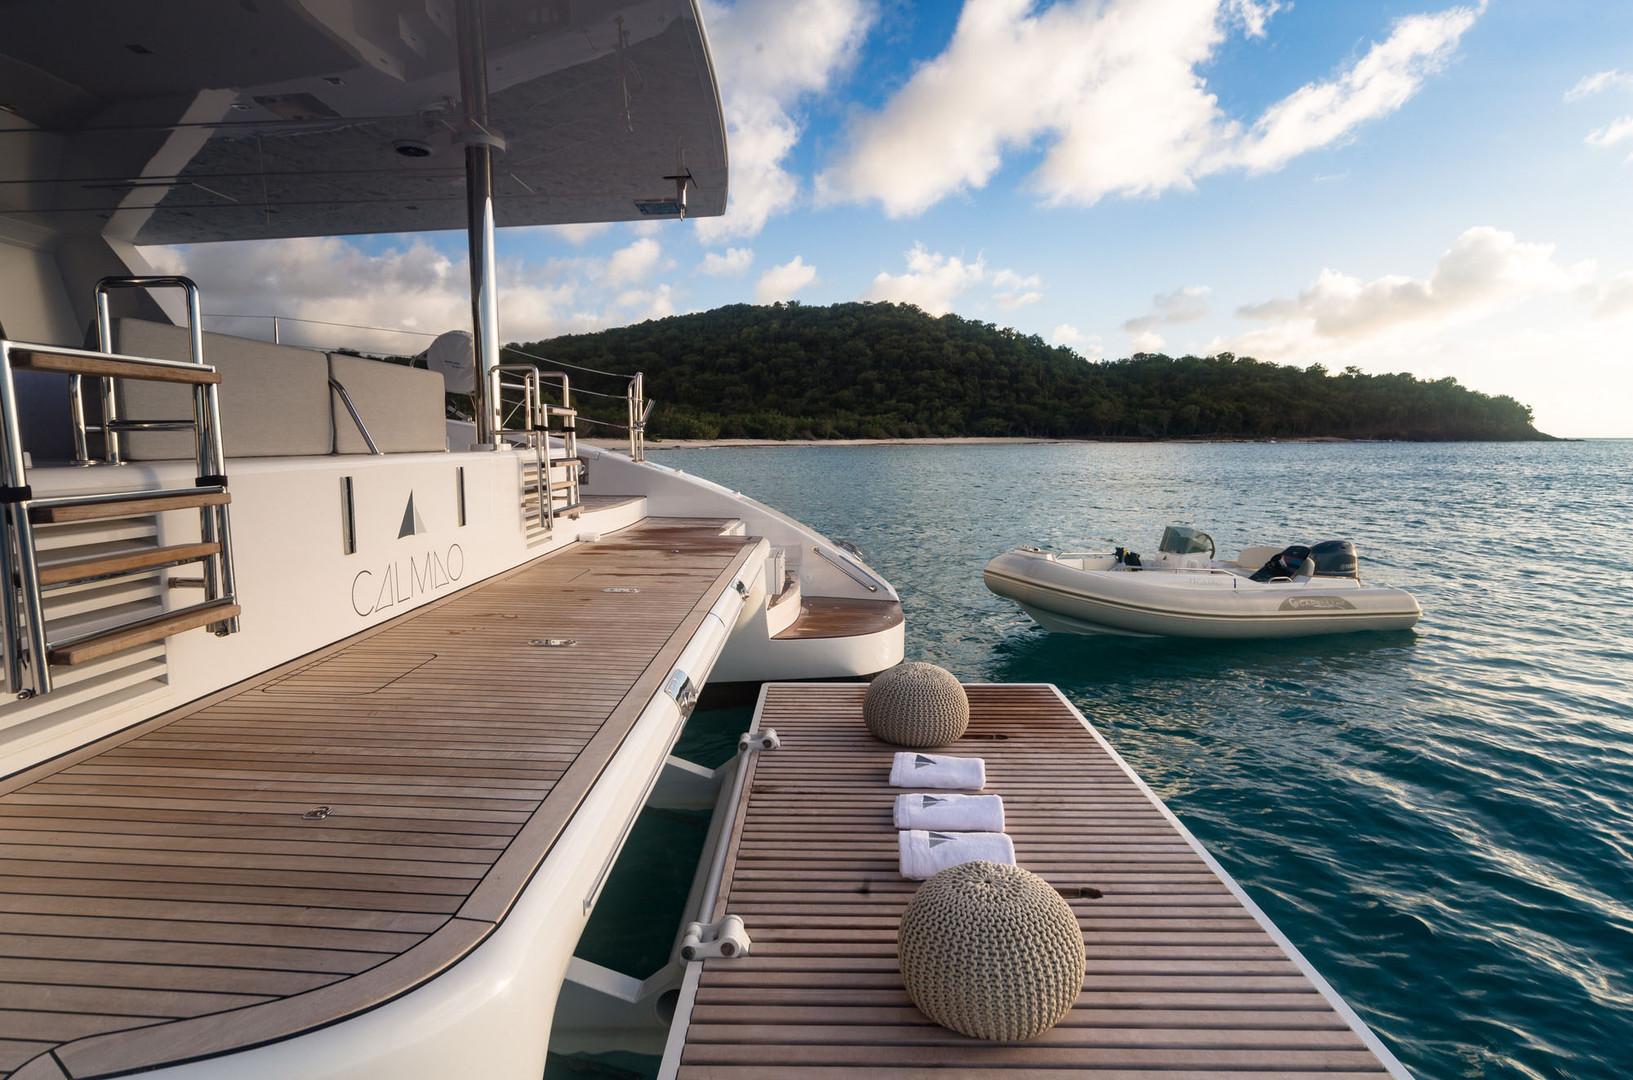 Yacht CALMAO - incredible sea access with full width hydraulic swim platform